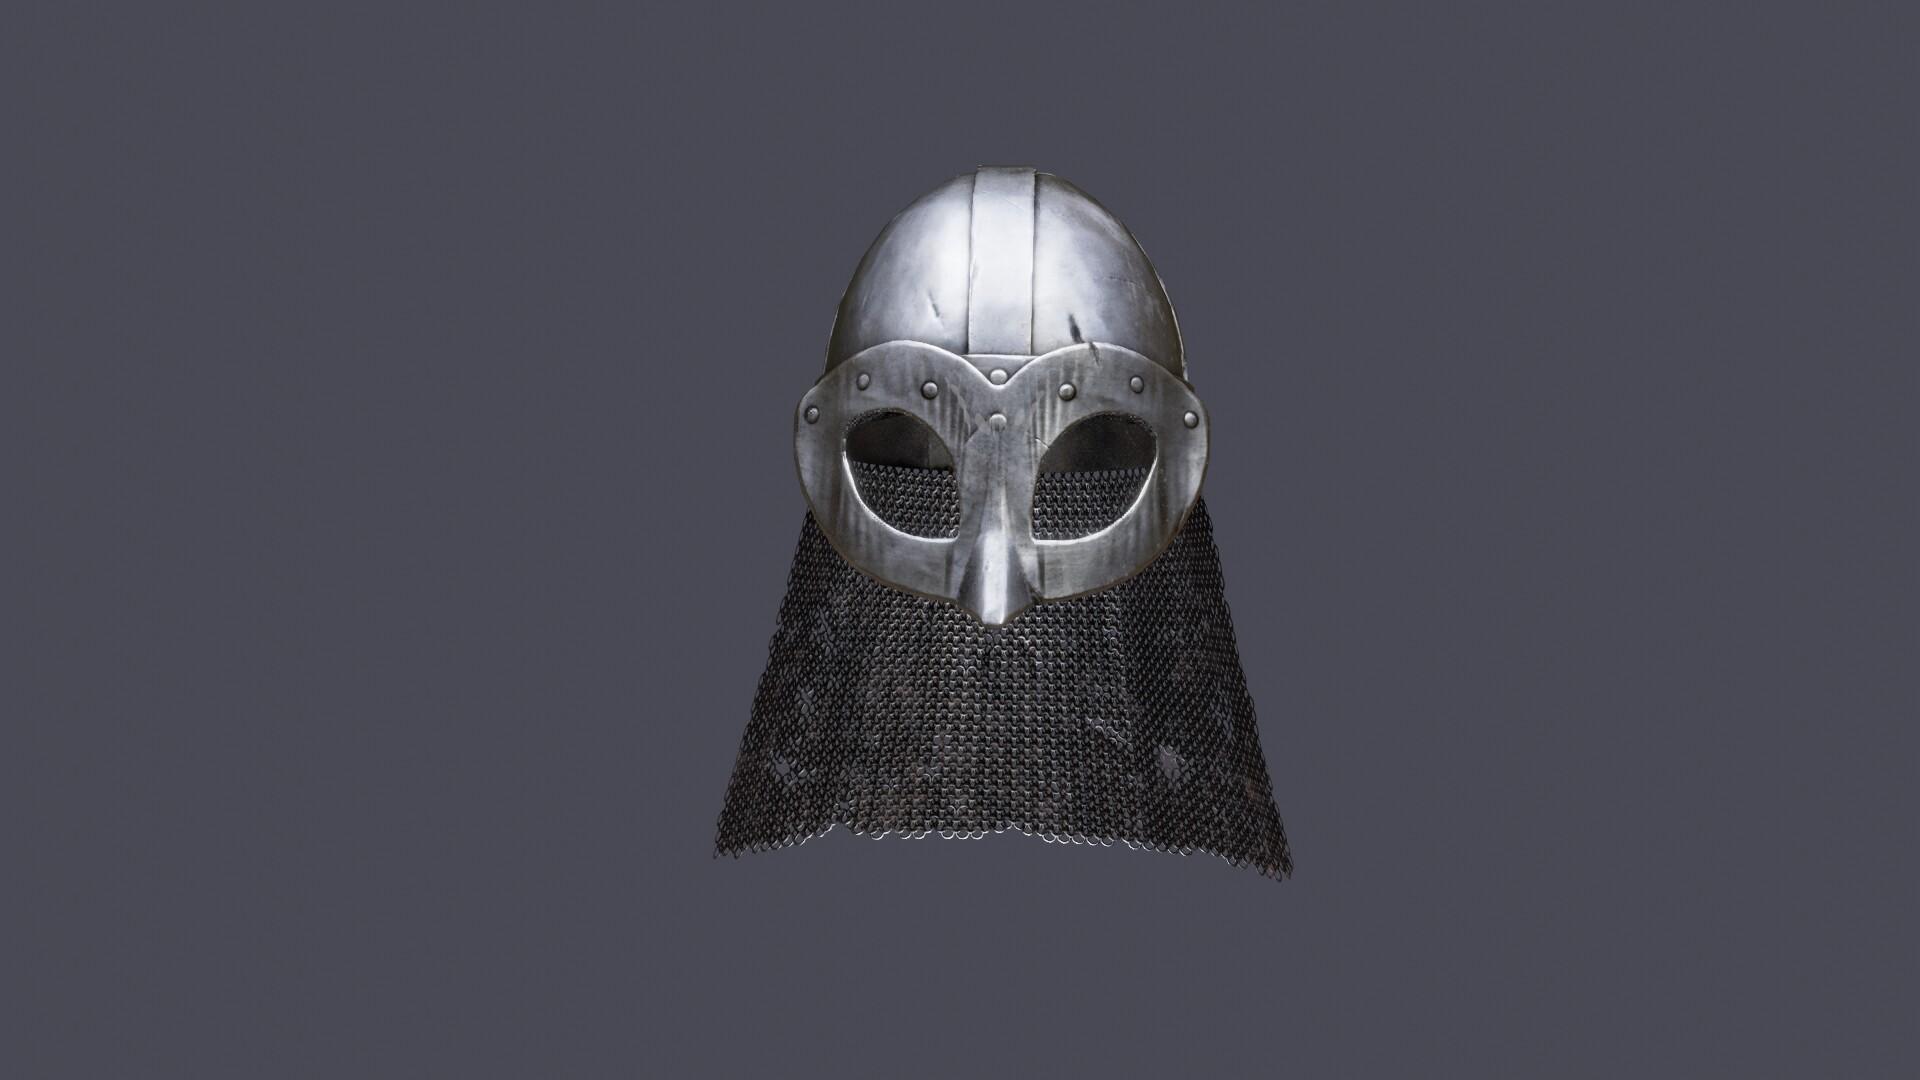 Dominik maral helmet